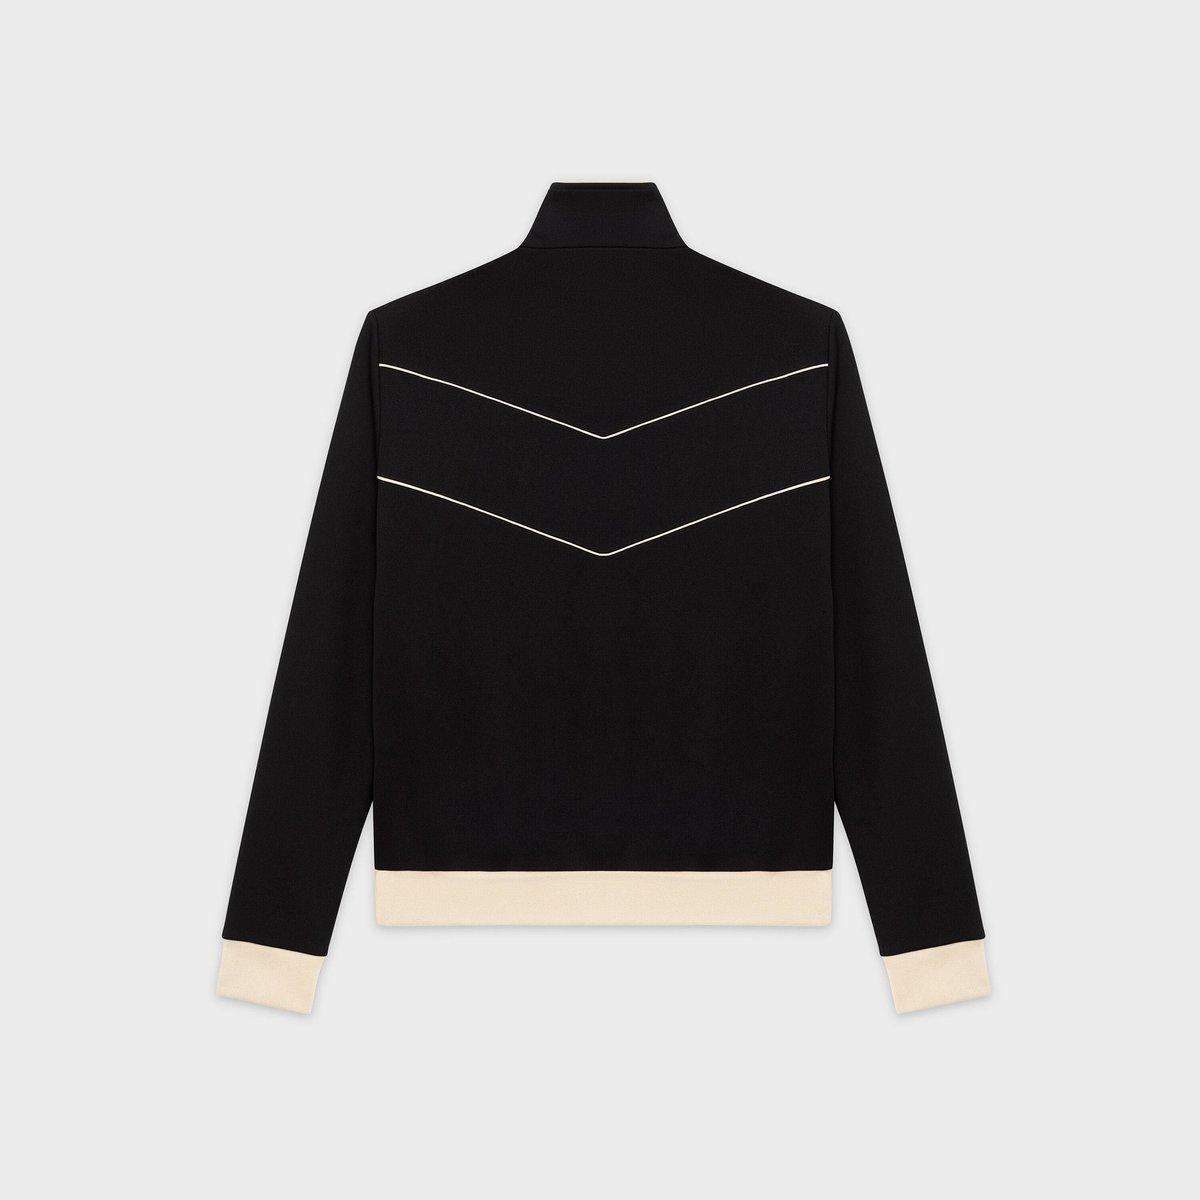 celine_triomphe_sweater_back.jpg